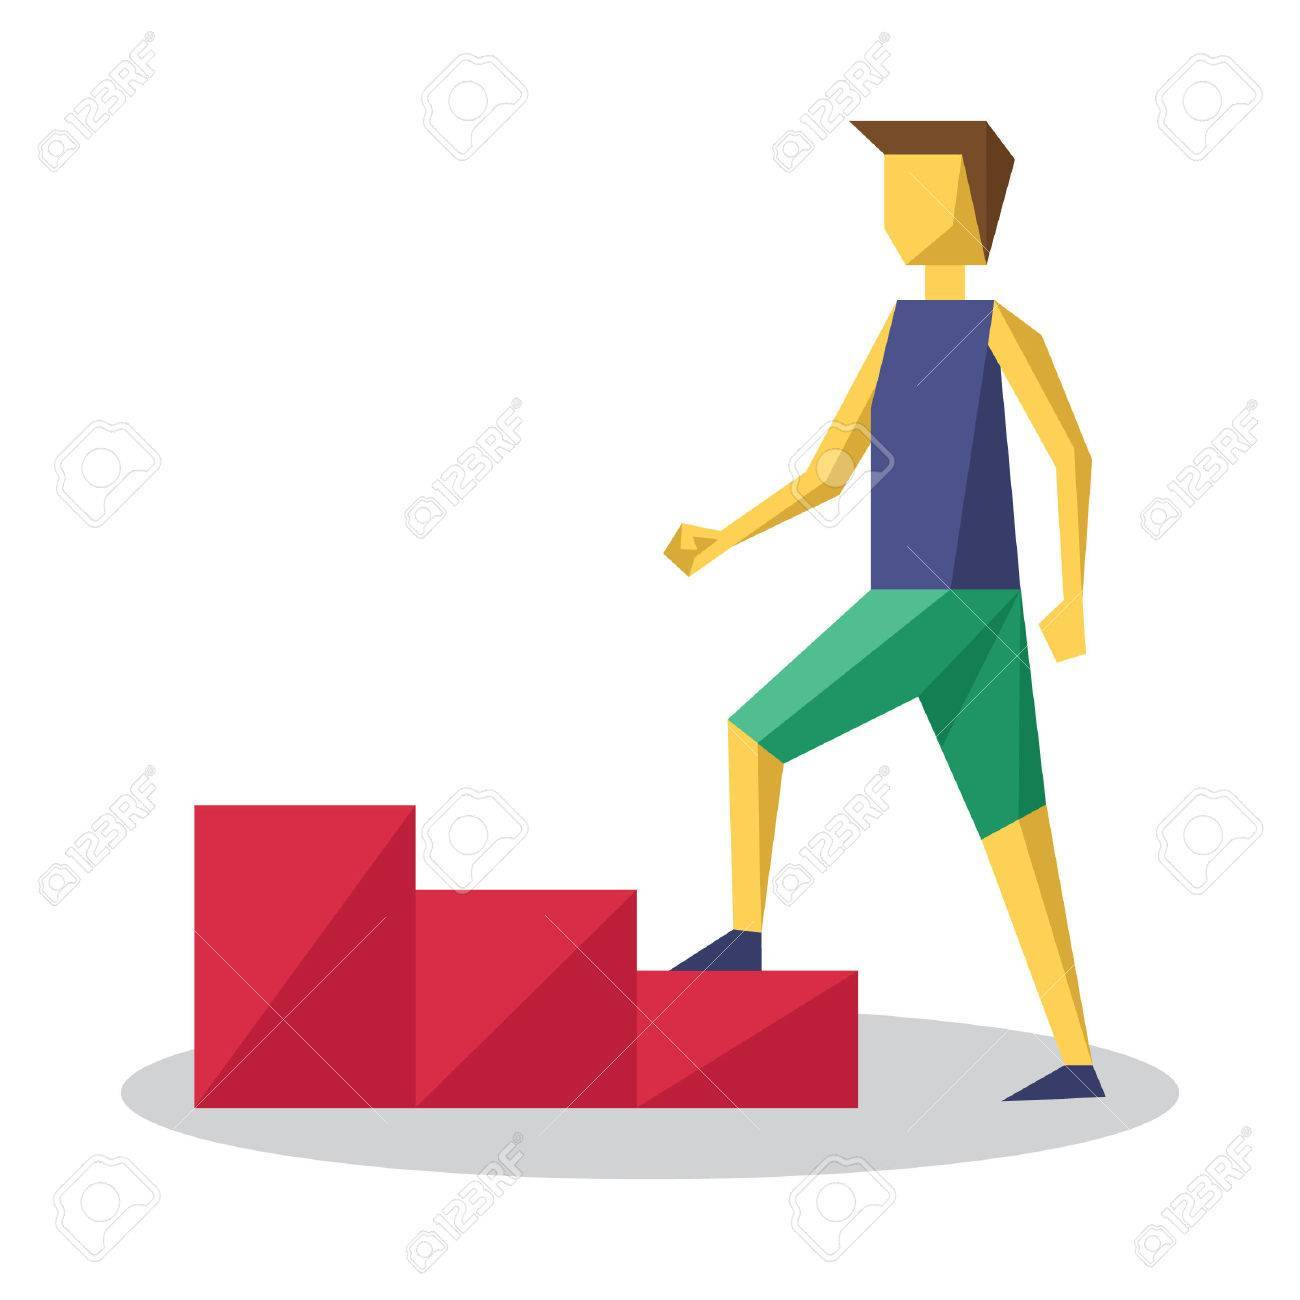 Man climbing stairs clipart 7 » Clipart Portal.